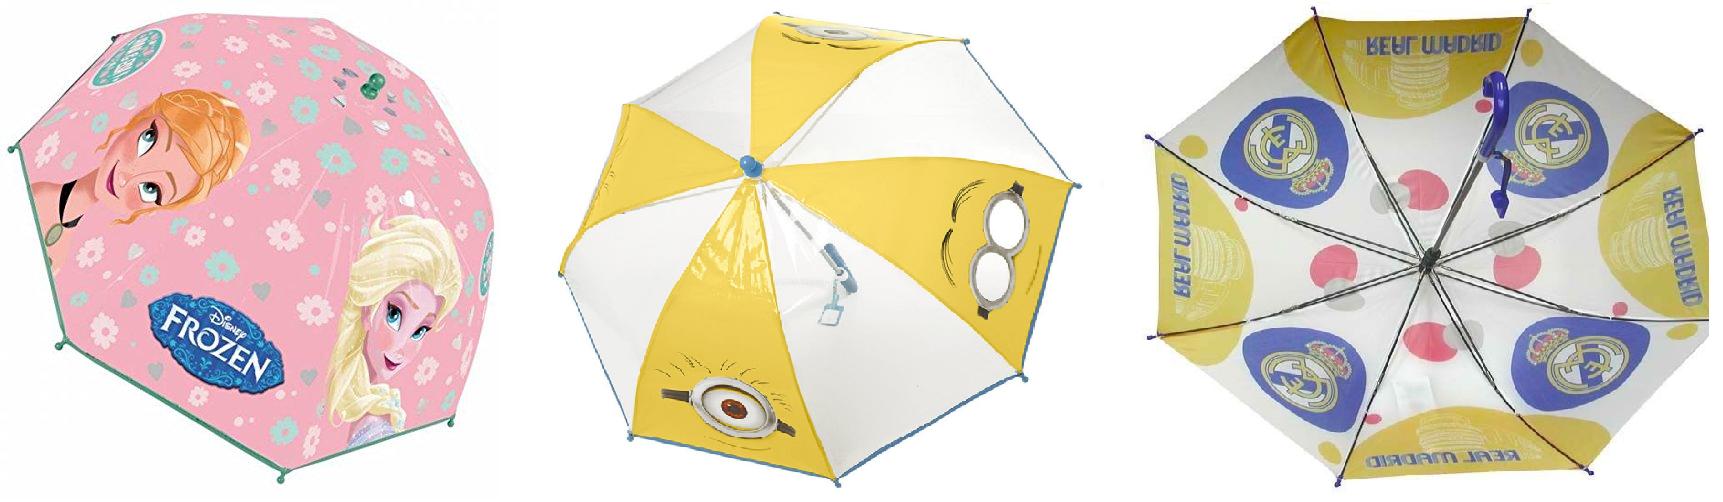 Moda para la lluvia - paraguas